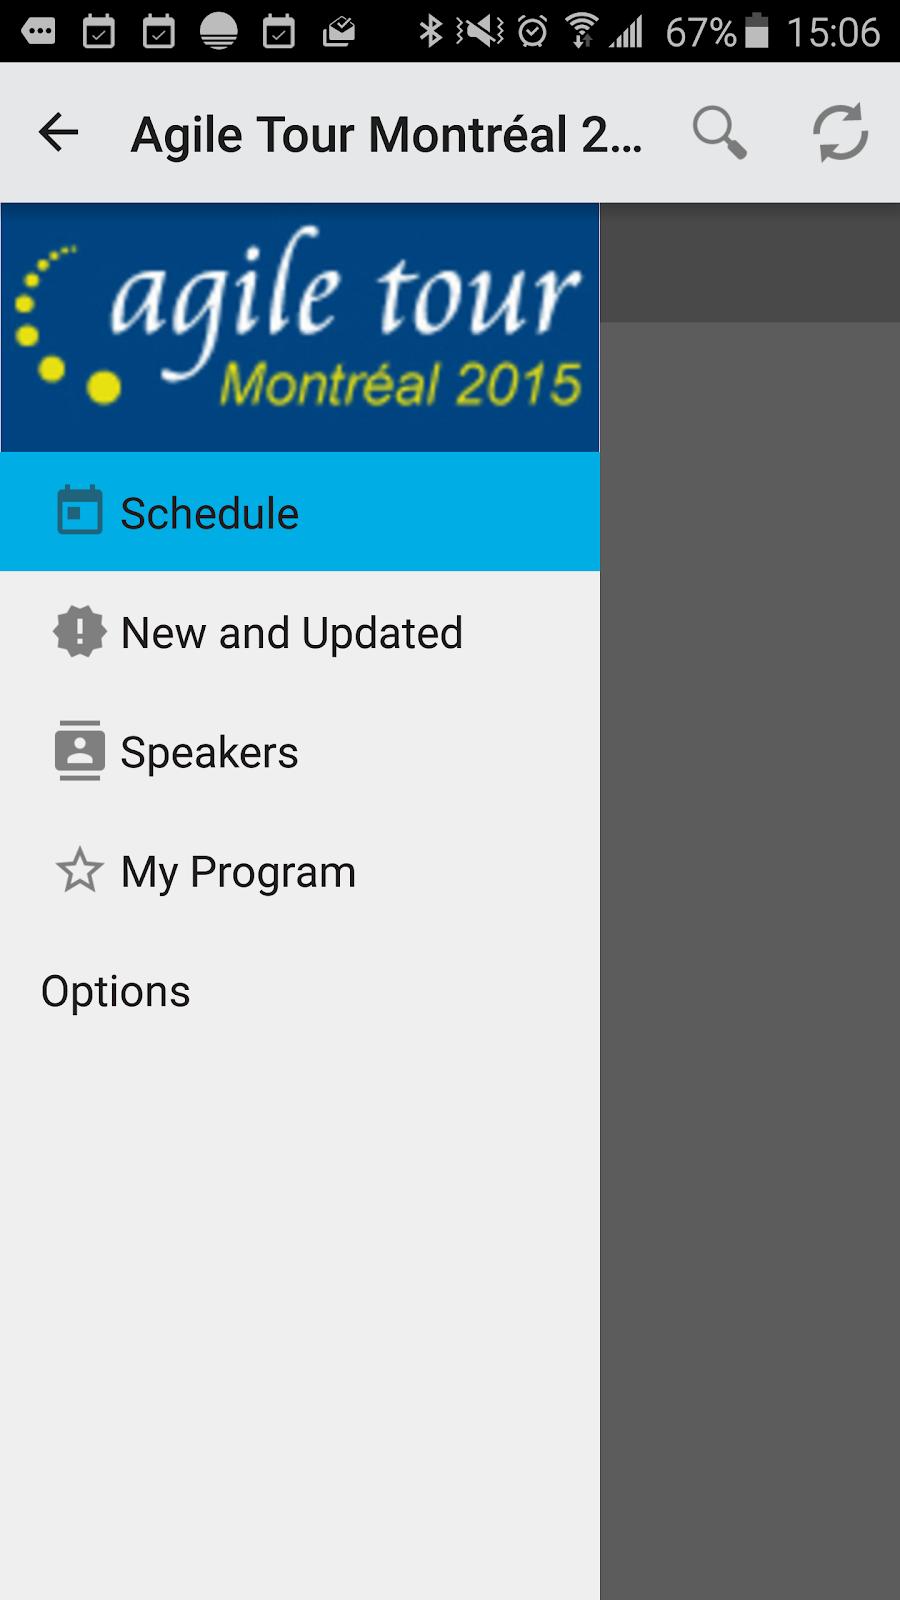 Screenshot_2015-10-13-15-06-51.png